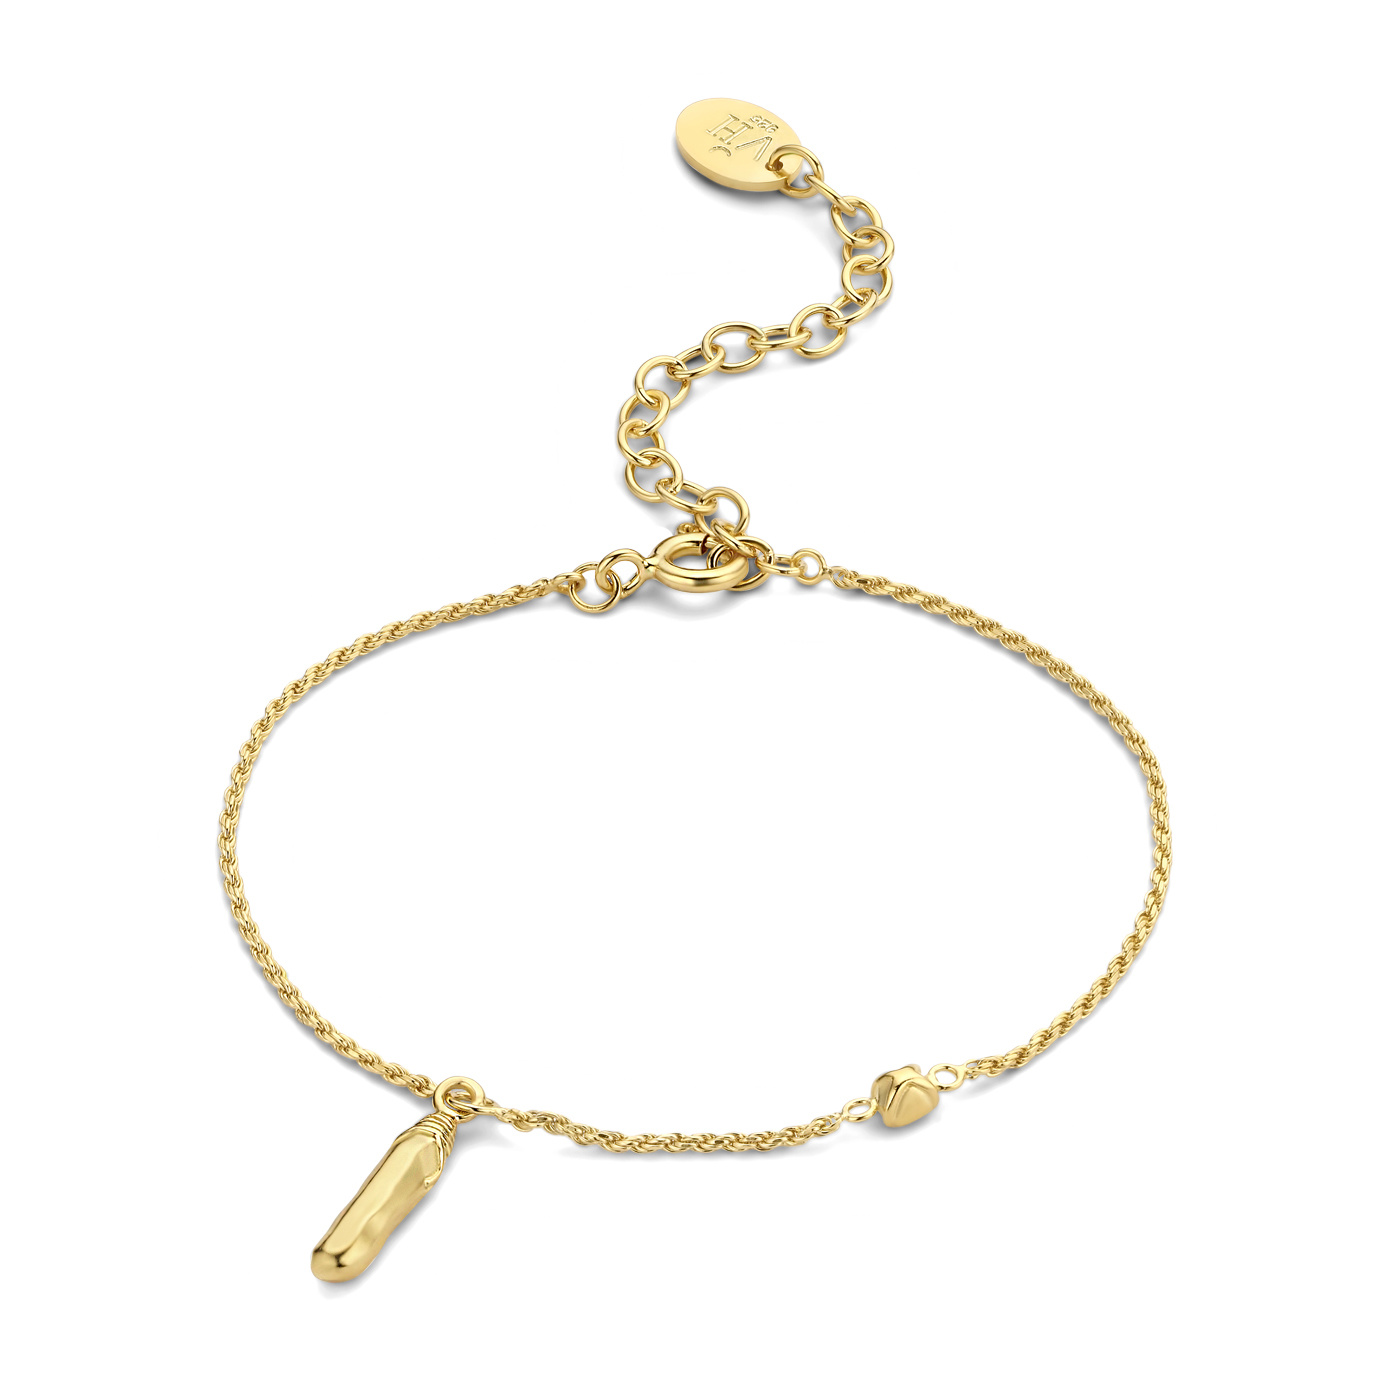 Violet Hamden Sisterhood Mona 925 sterling zilver goudkleurige armband met staafje en steentje